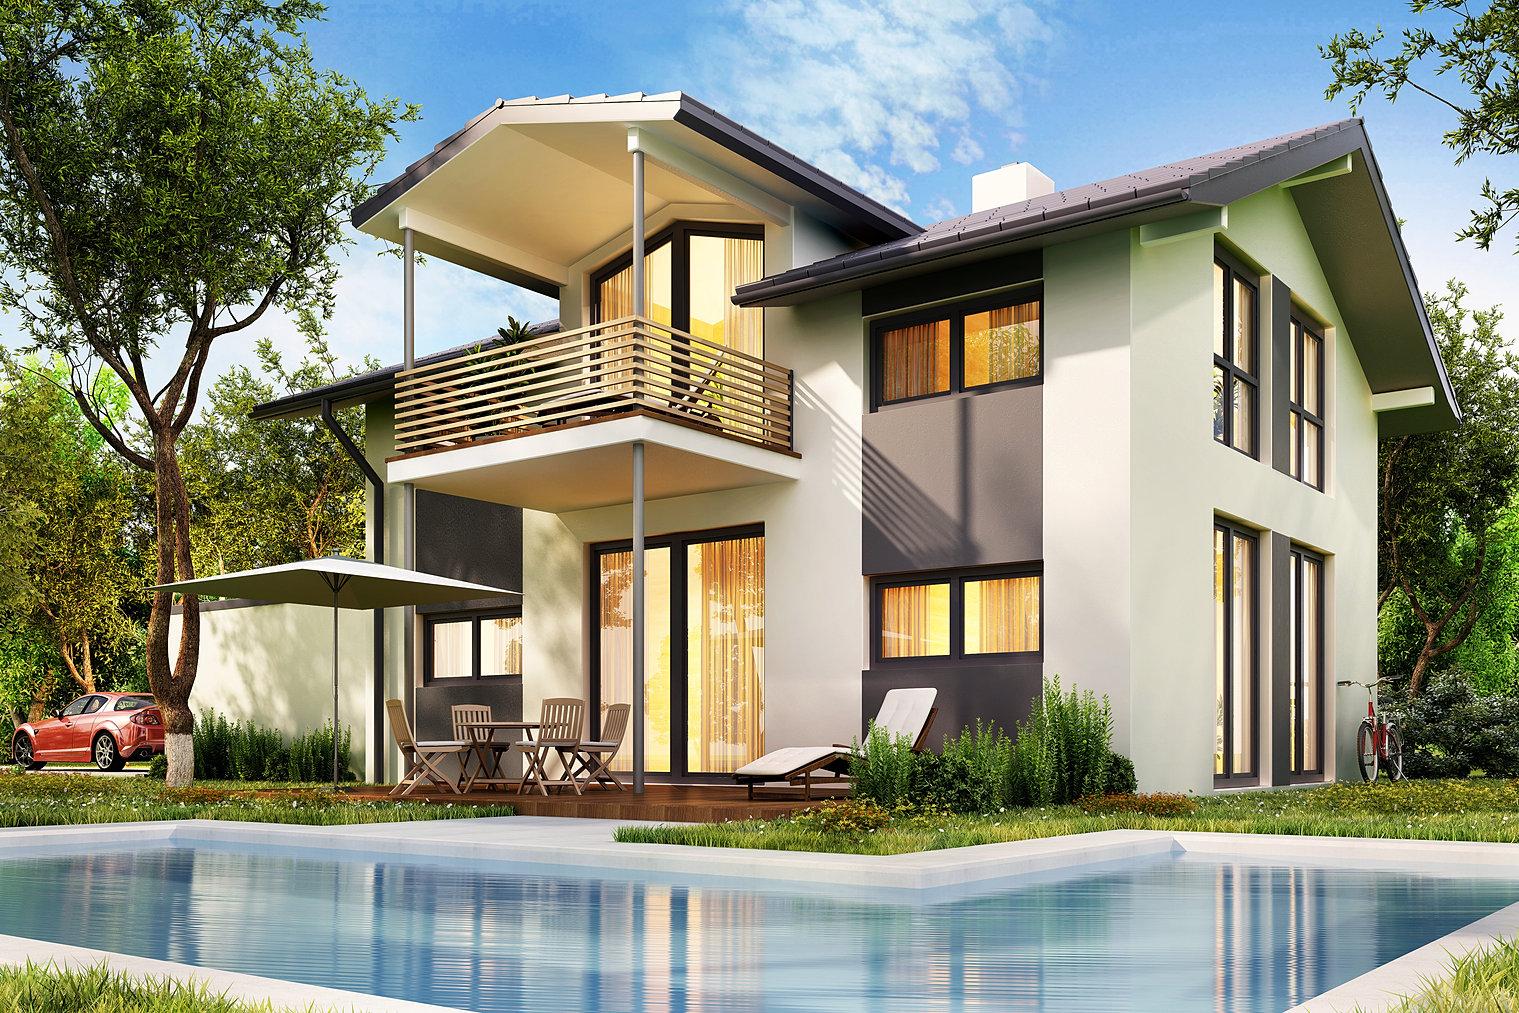 Haus4you satteldach modern for Innenplanung haus